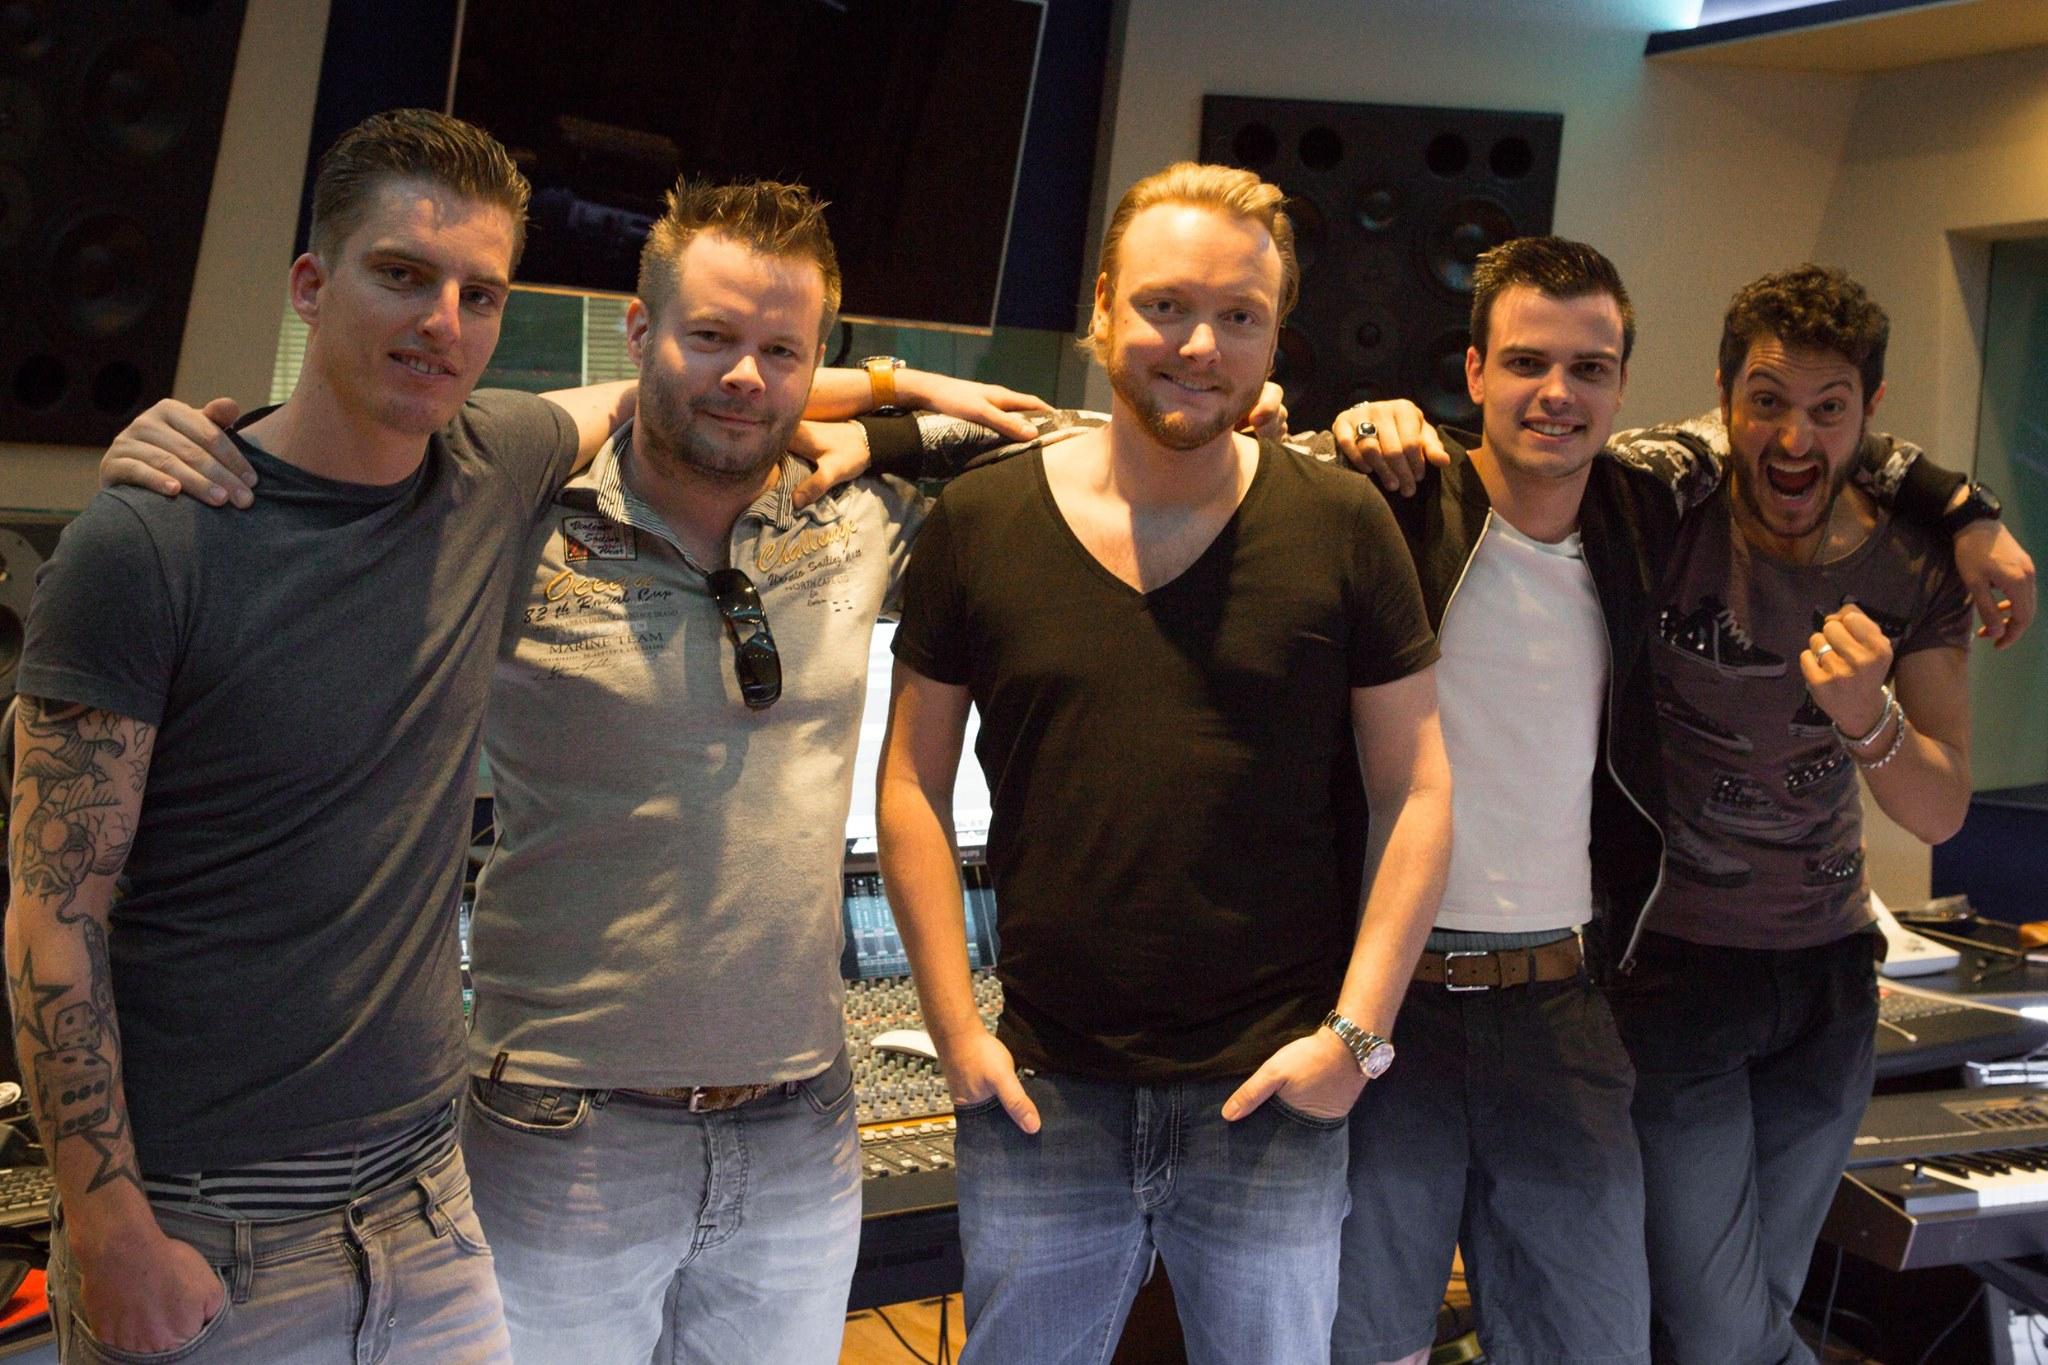 John Christian, Arin Tone, Peter, Thomas